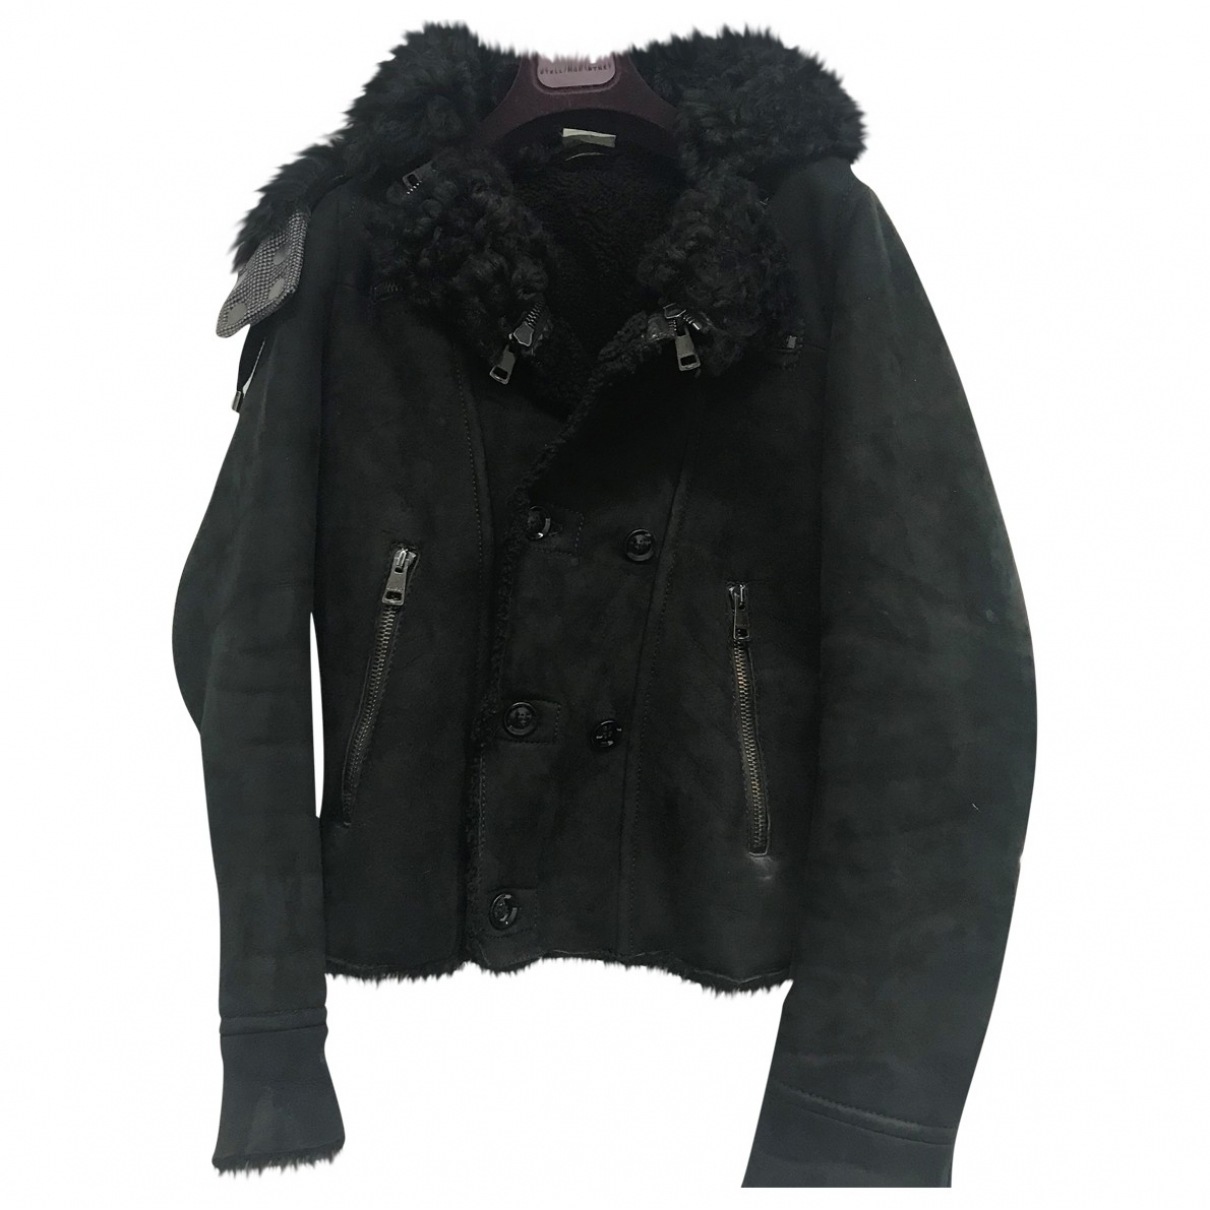 Gucci \N Black Suede jacket for Women 42 IT